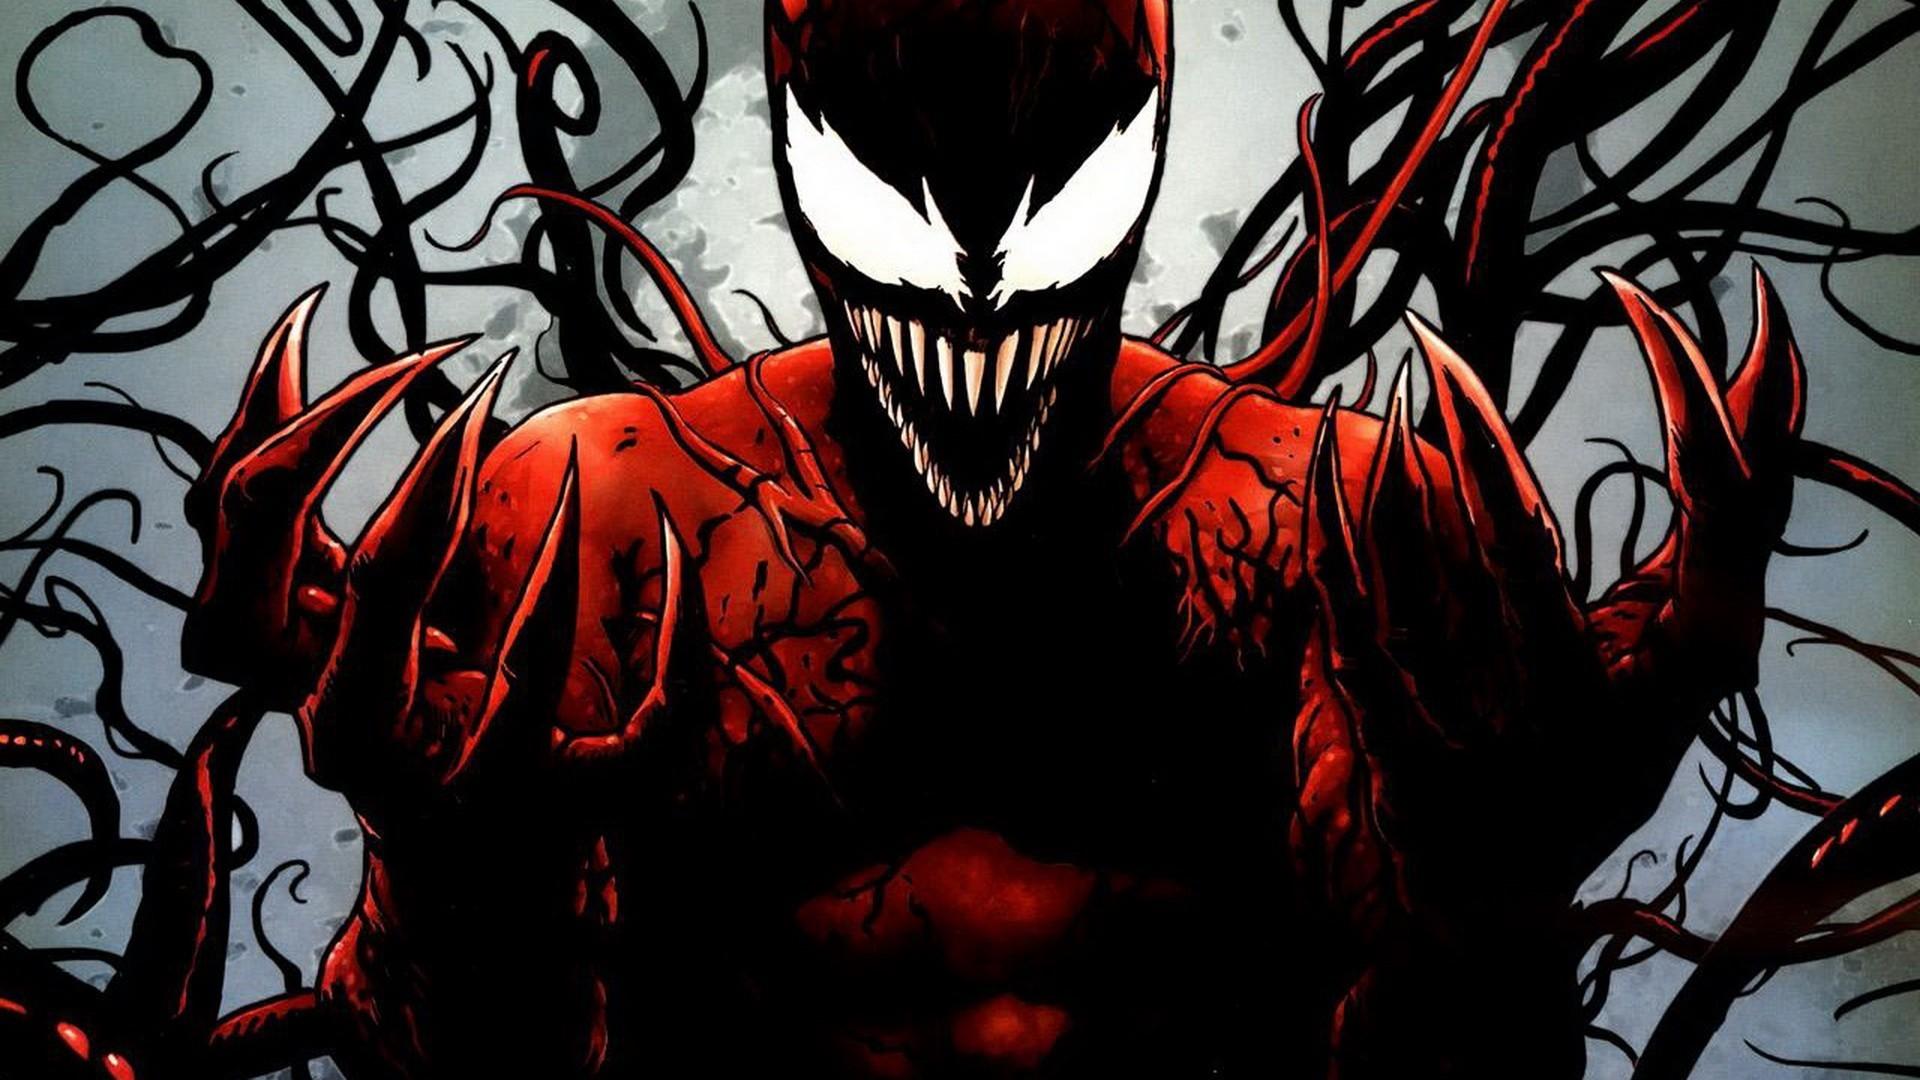 Venom Vs Carnage Wallpaper 70 Images